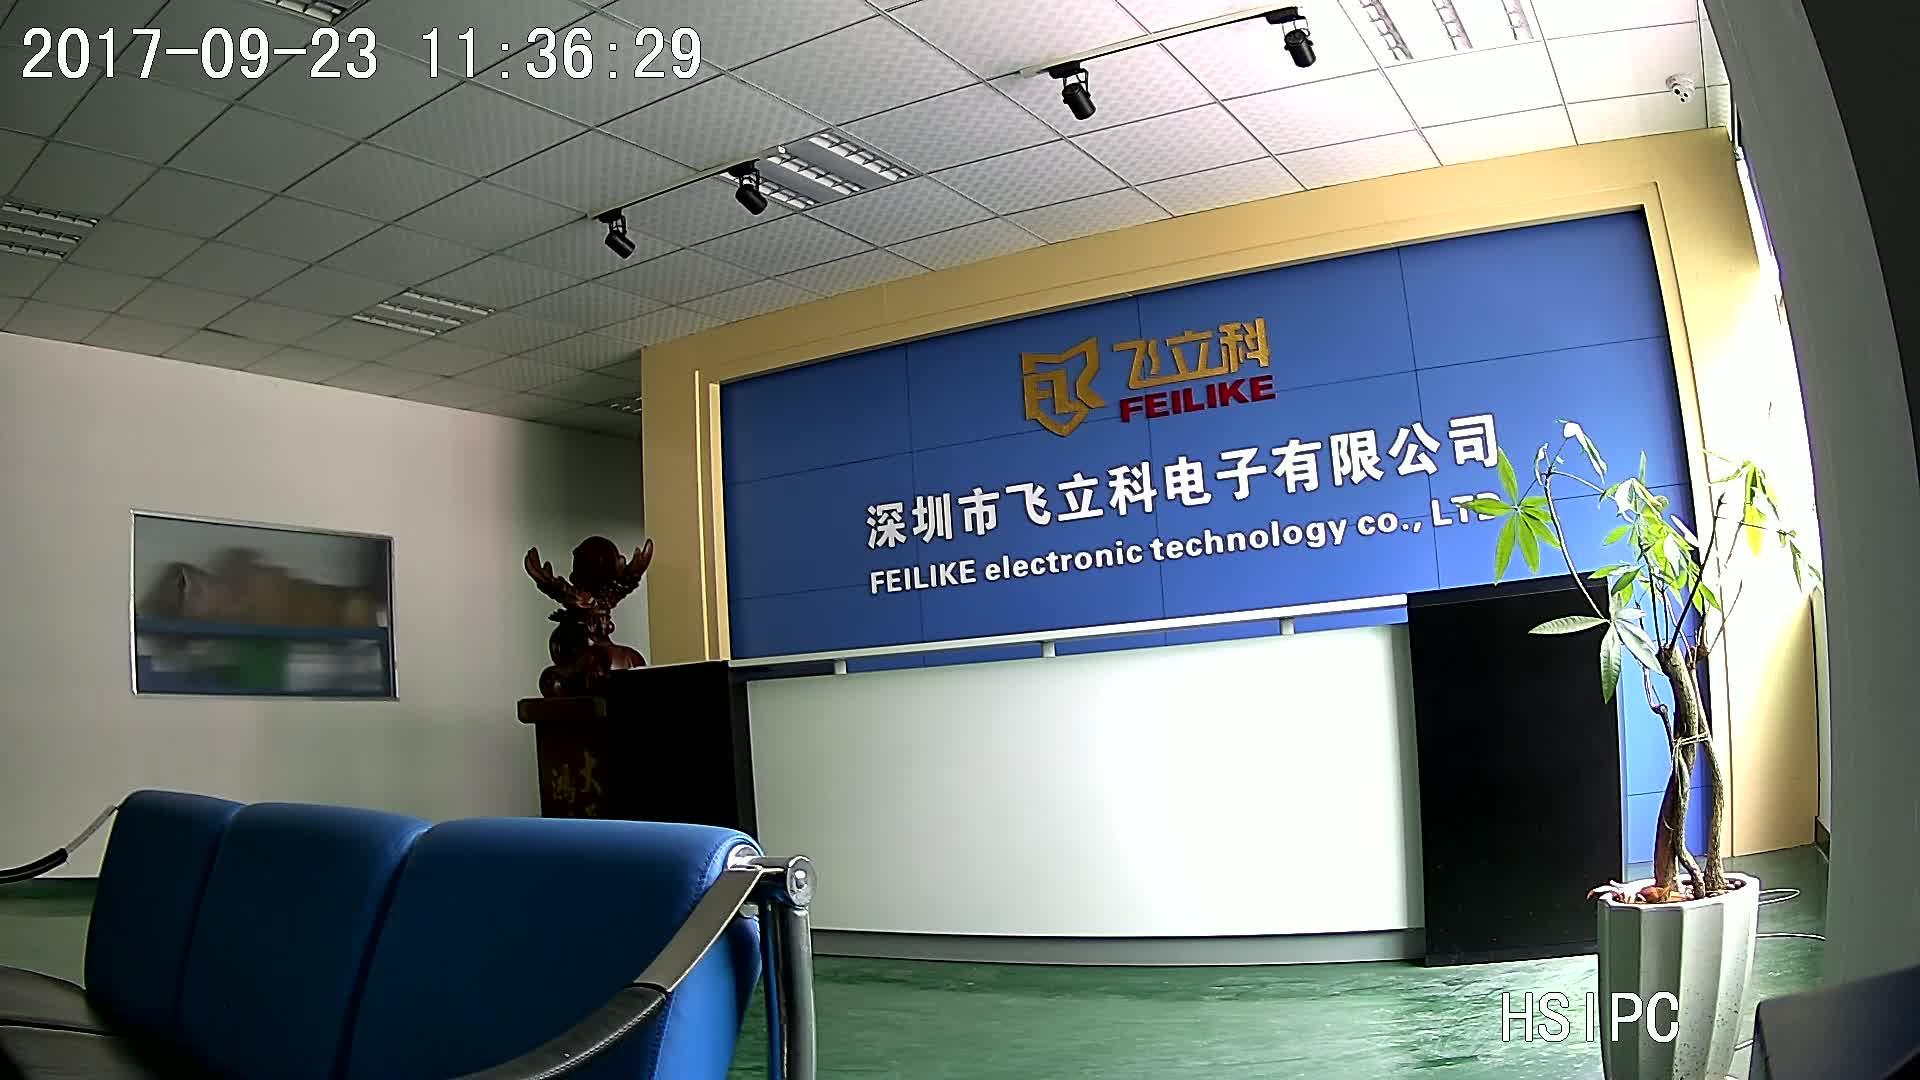 HDiDVR Беспроводной IP камера товары теле и видеонаблюдения комплект s Wi Fi 4CH 8CH Wi Fi ip с nvr комплект